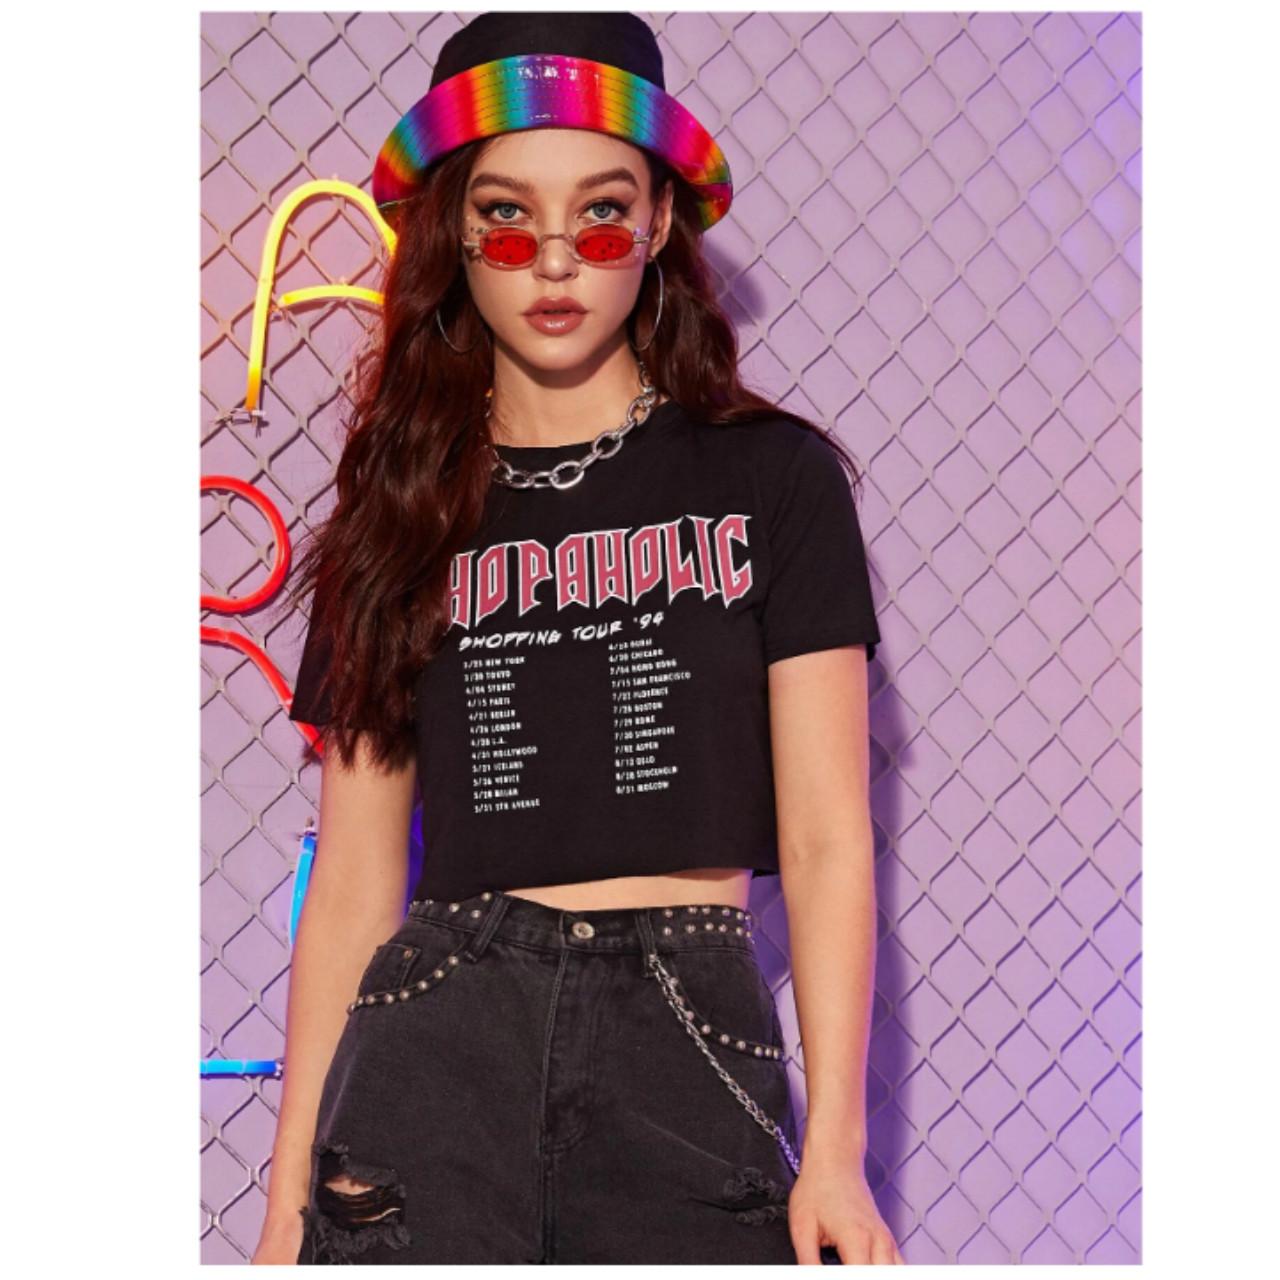 Shopaholic graphic boxy cropped tee s